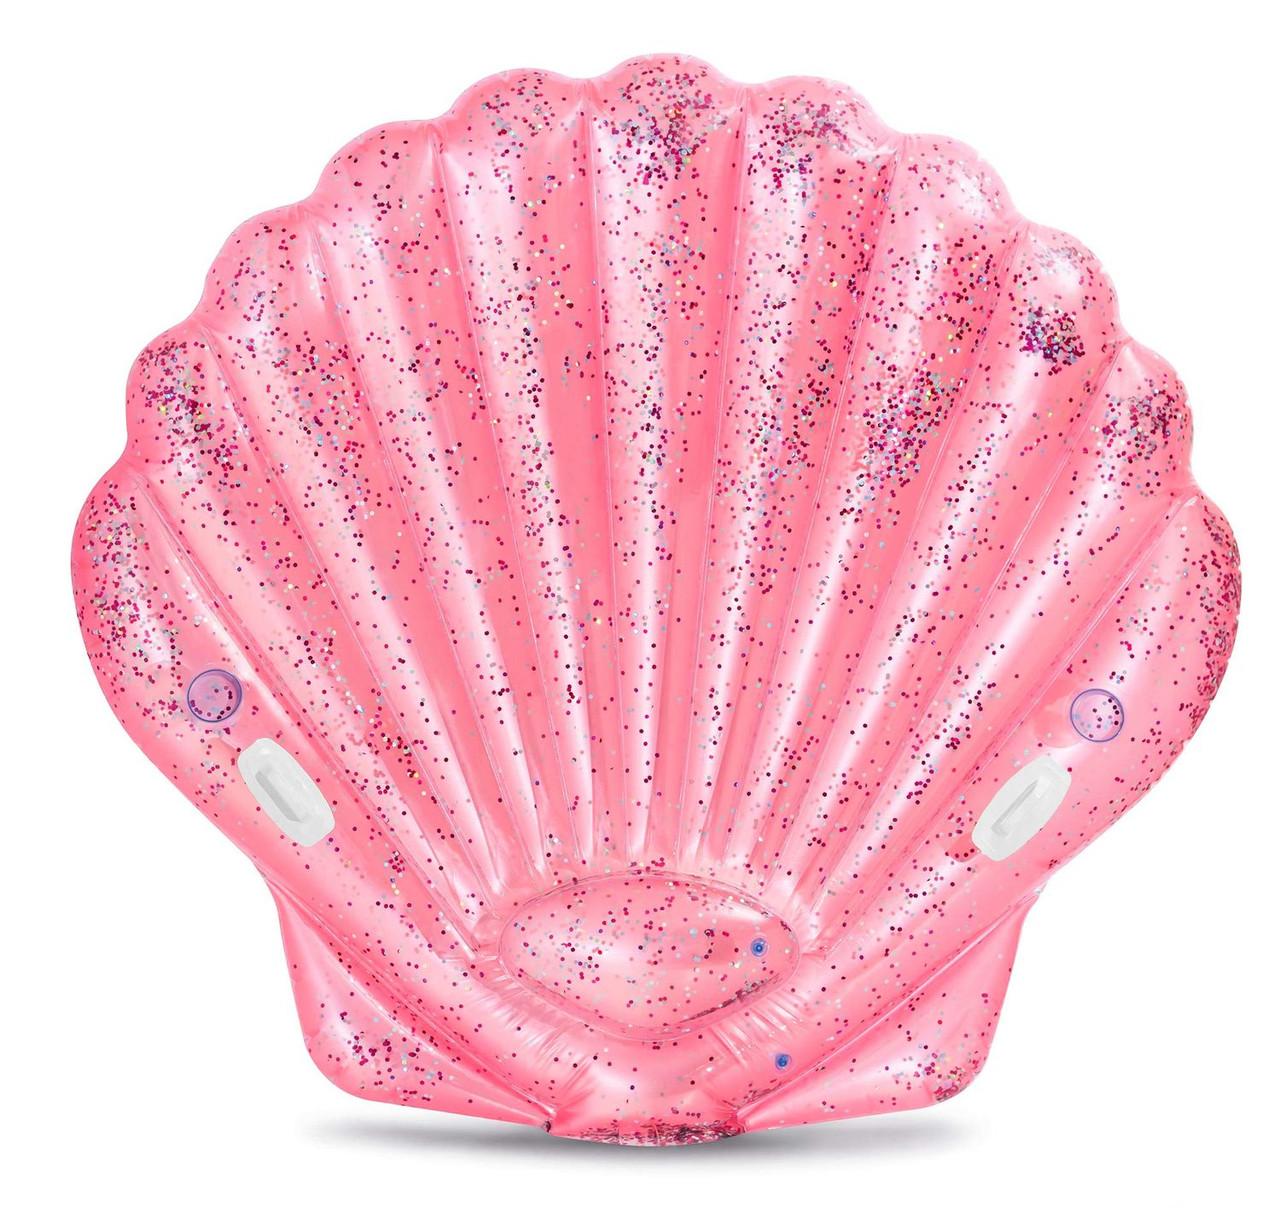 Матрас надувной для плавания на море Intex 57257 EU 178х165х24см Розовая ракушка